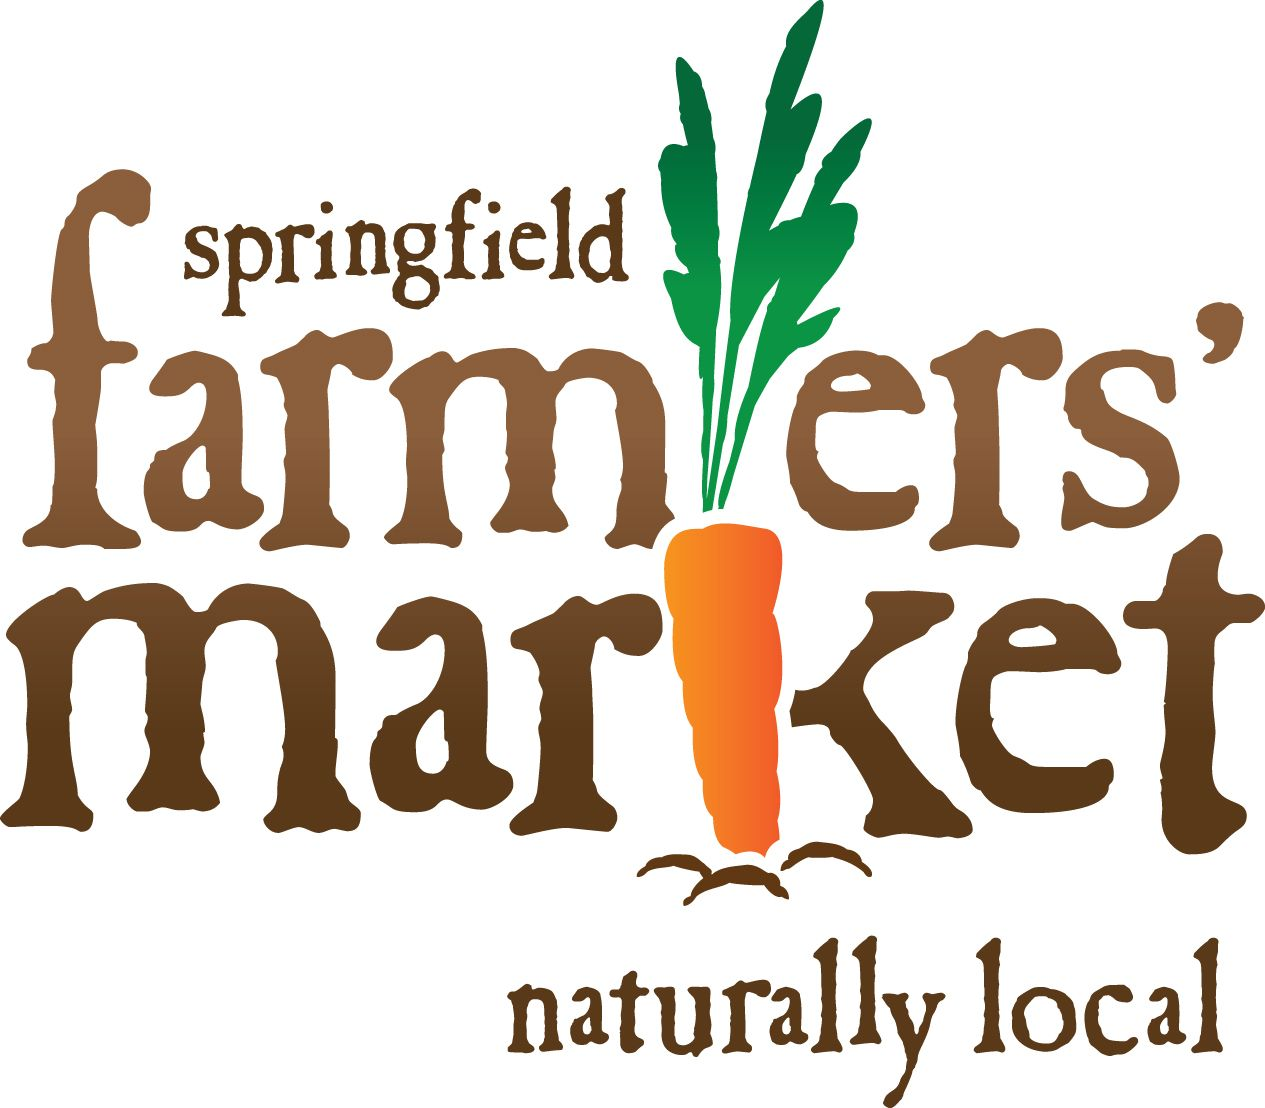 Springfield Farmers Market Flea Market/Crafter Day